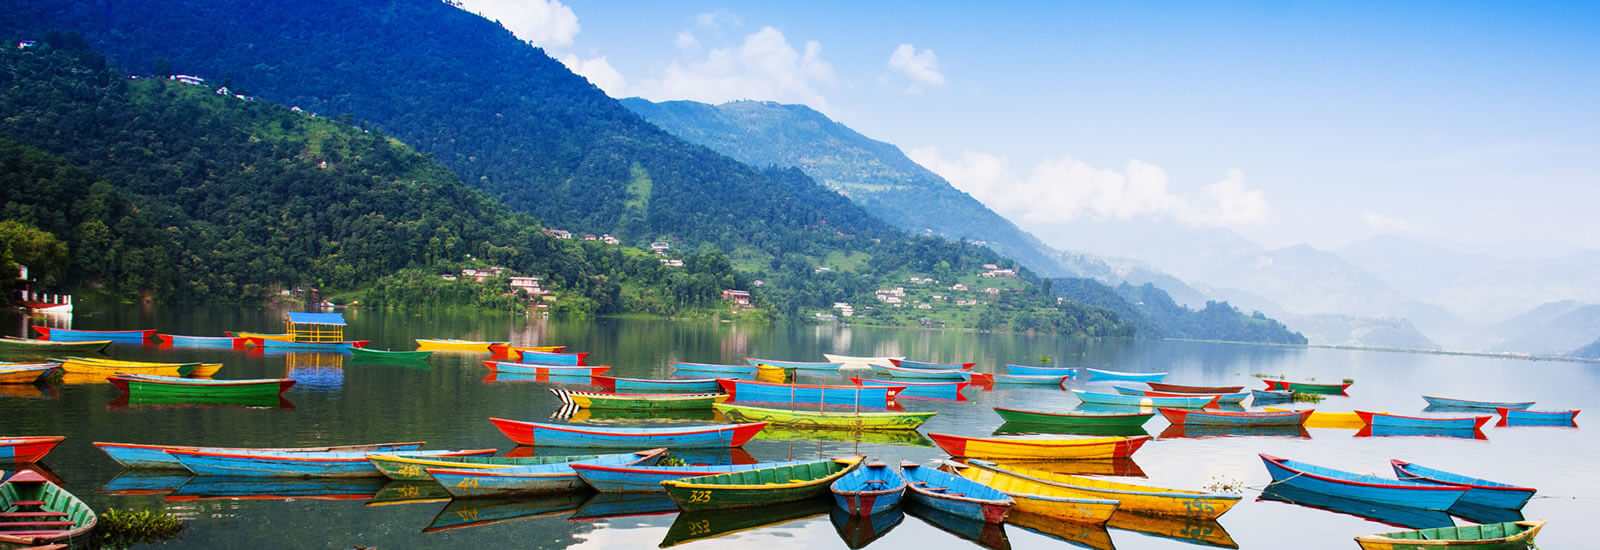 5 Nights 6 Days  Kathmandu Pokhara Tour